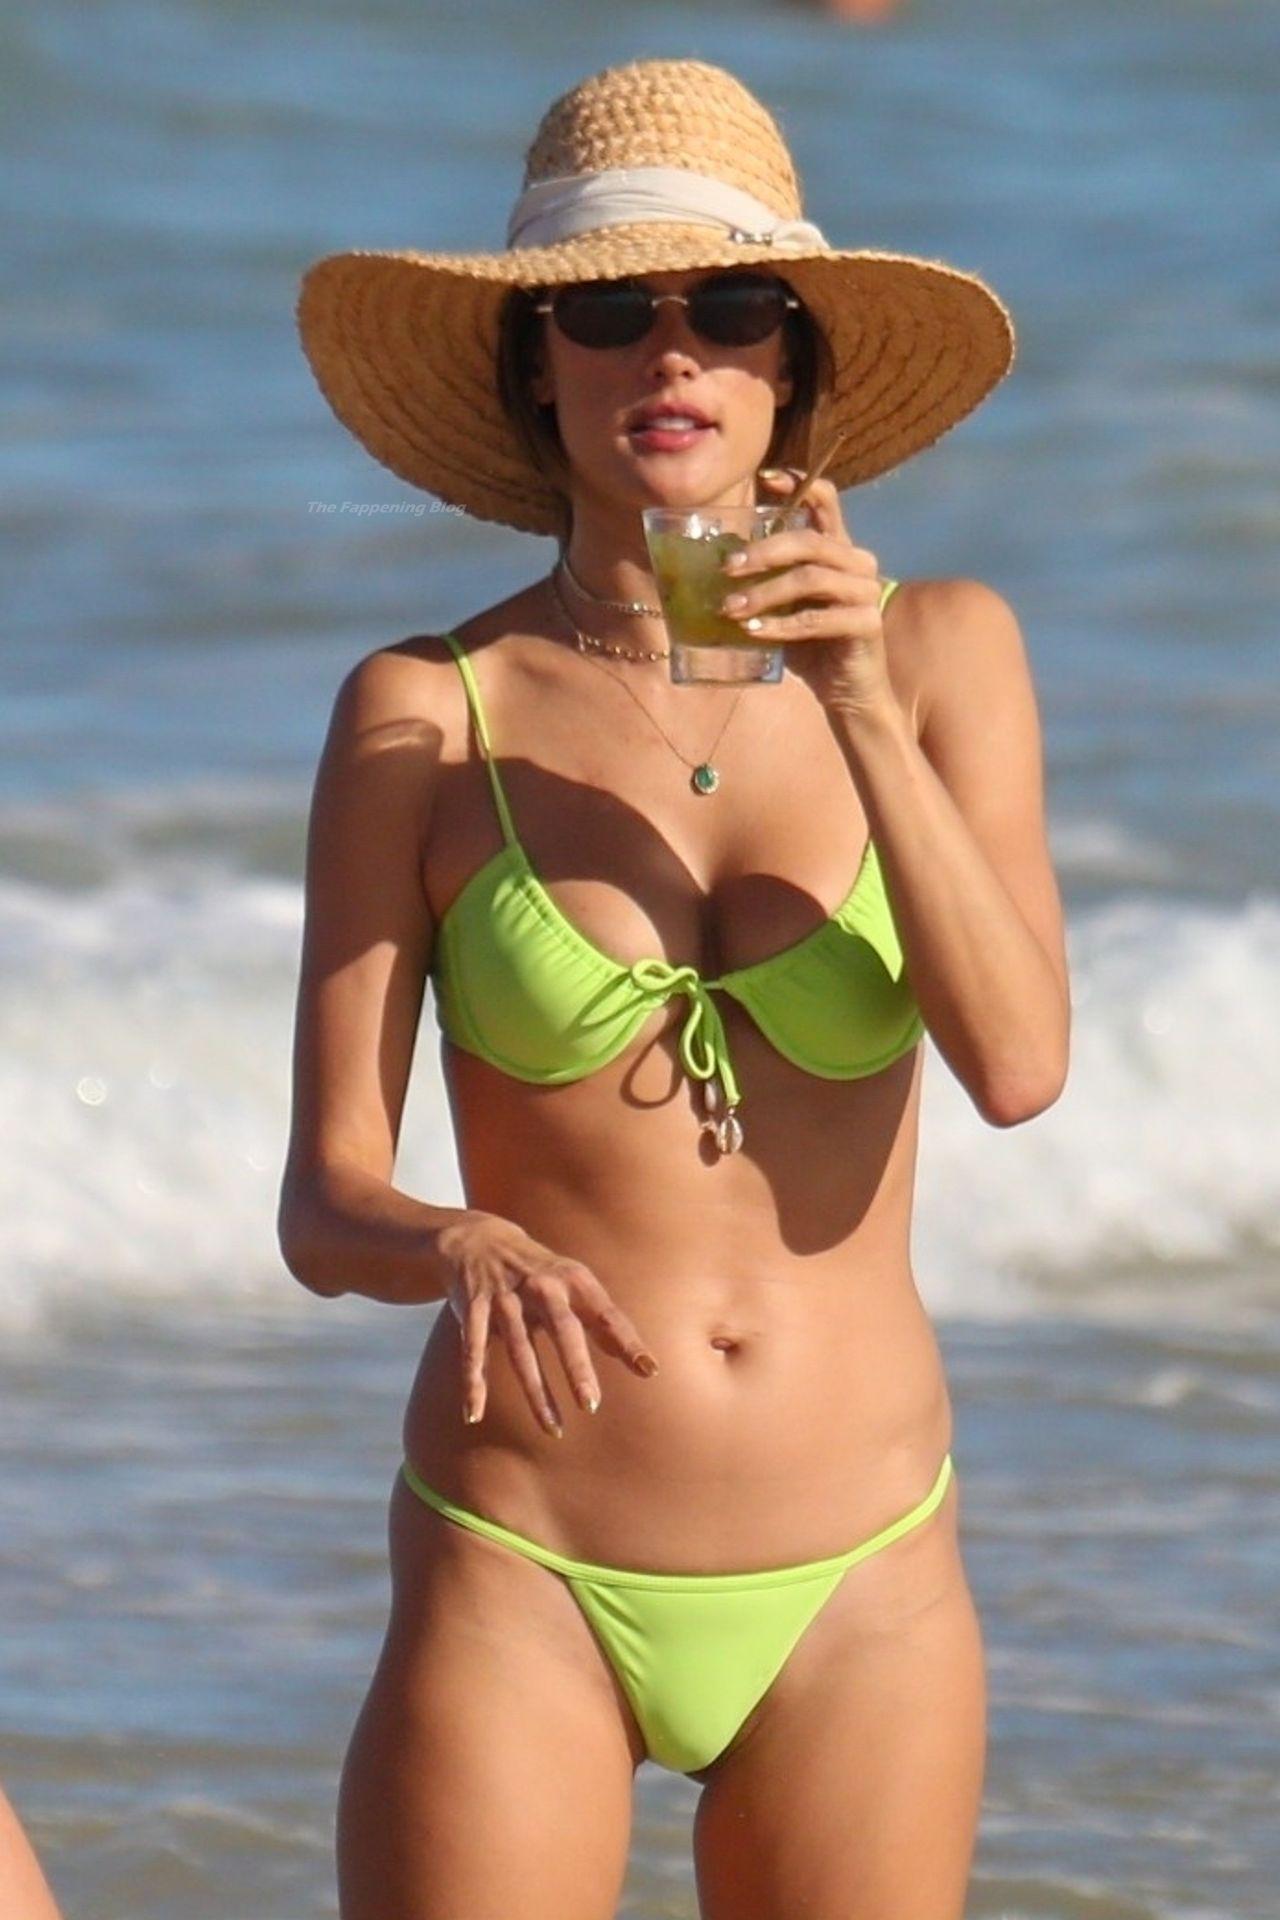 Alessandra-Ambrosio-Sexy-The-Fappening-Blog-721.jpg